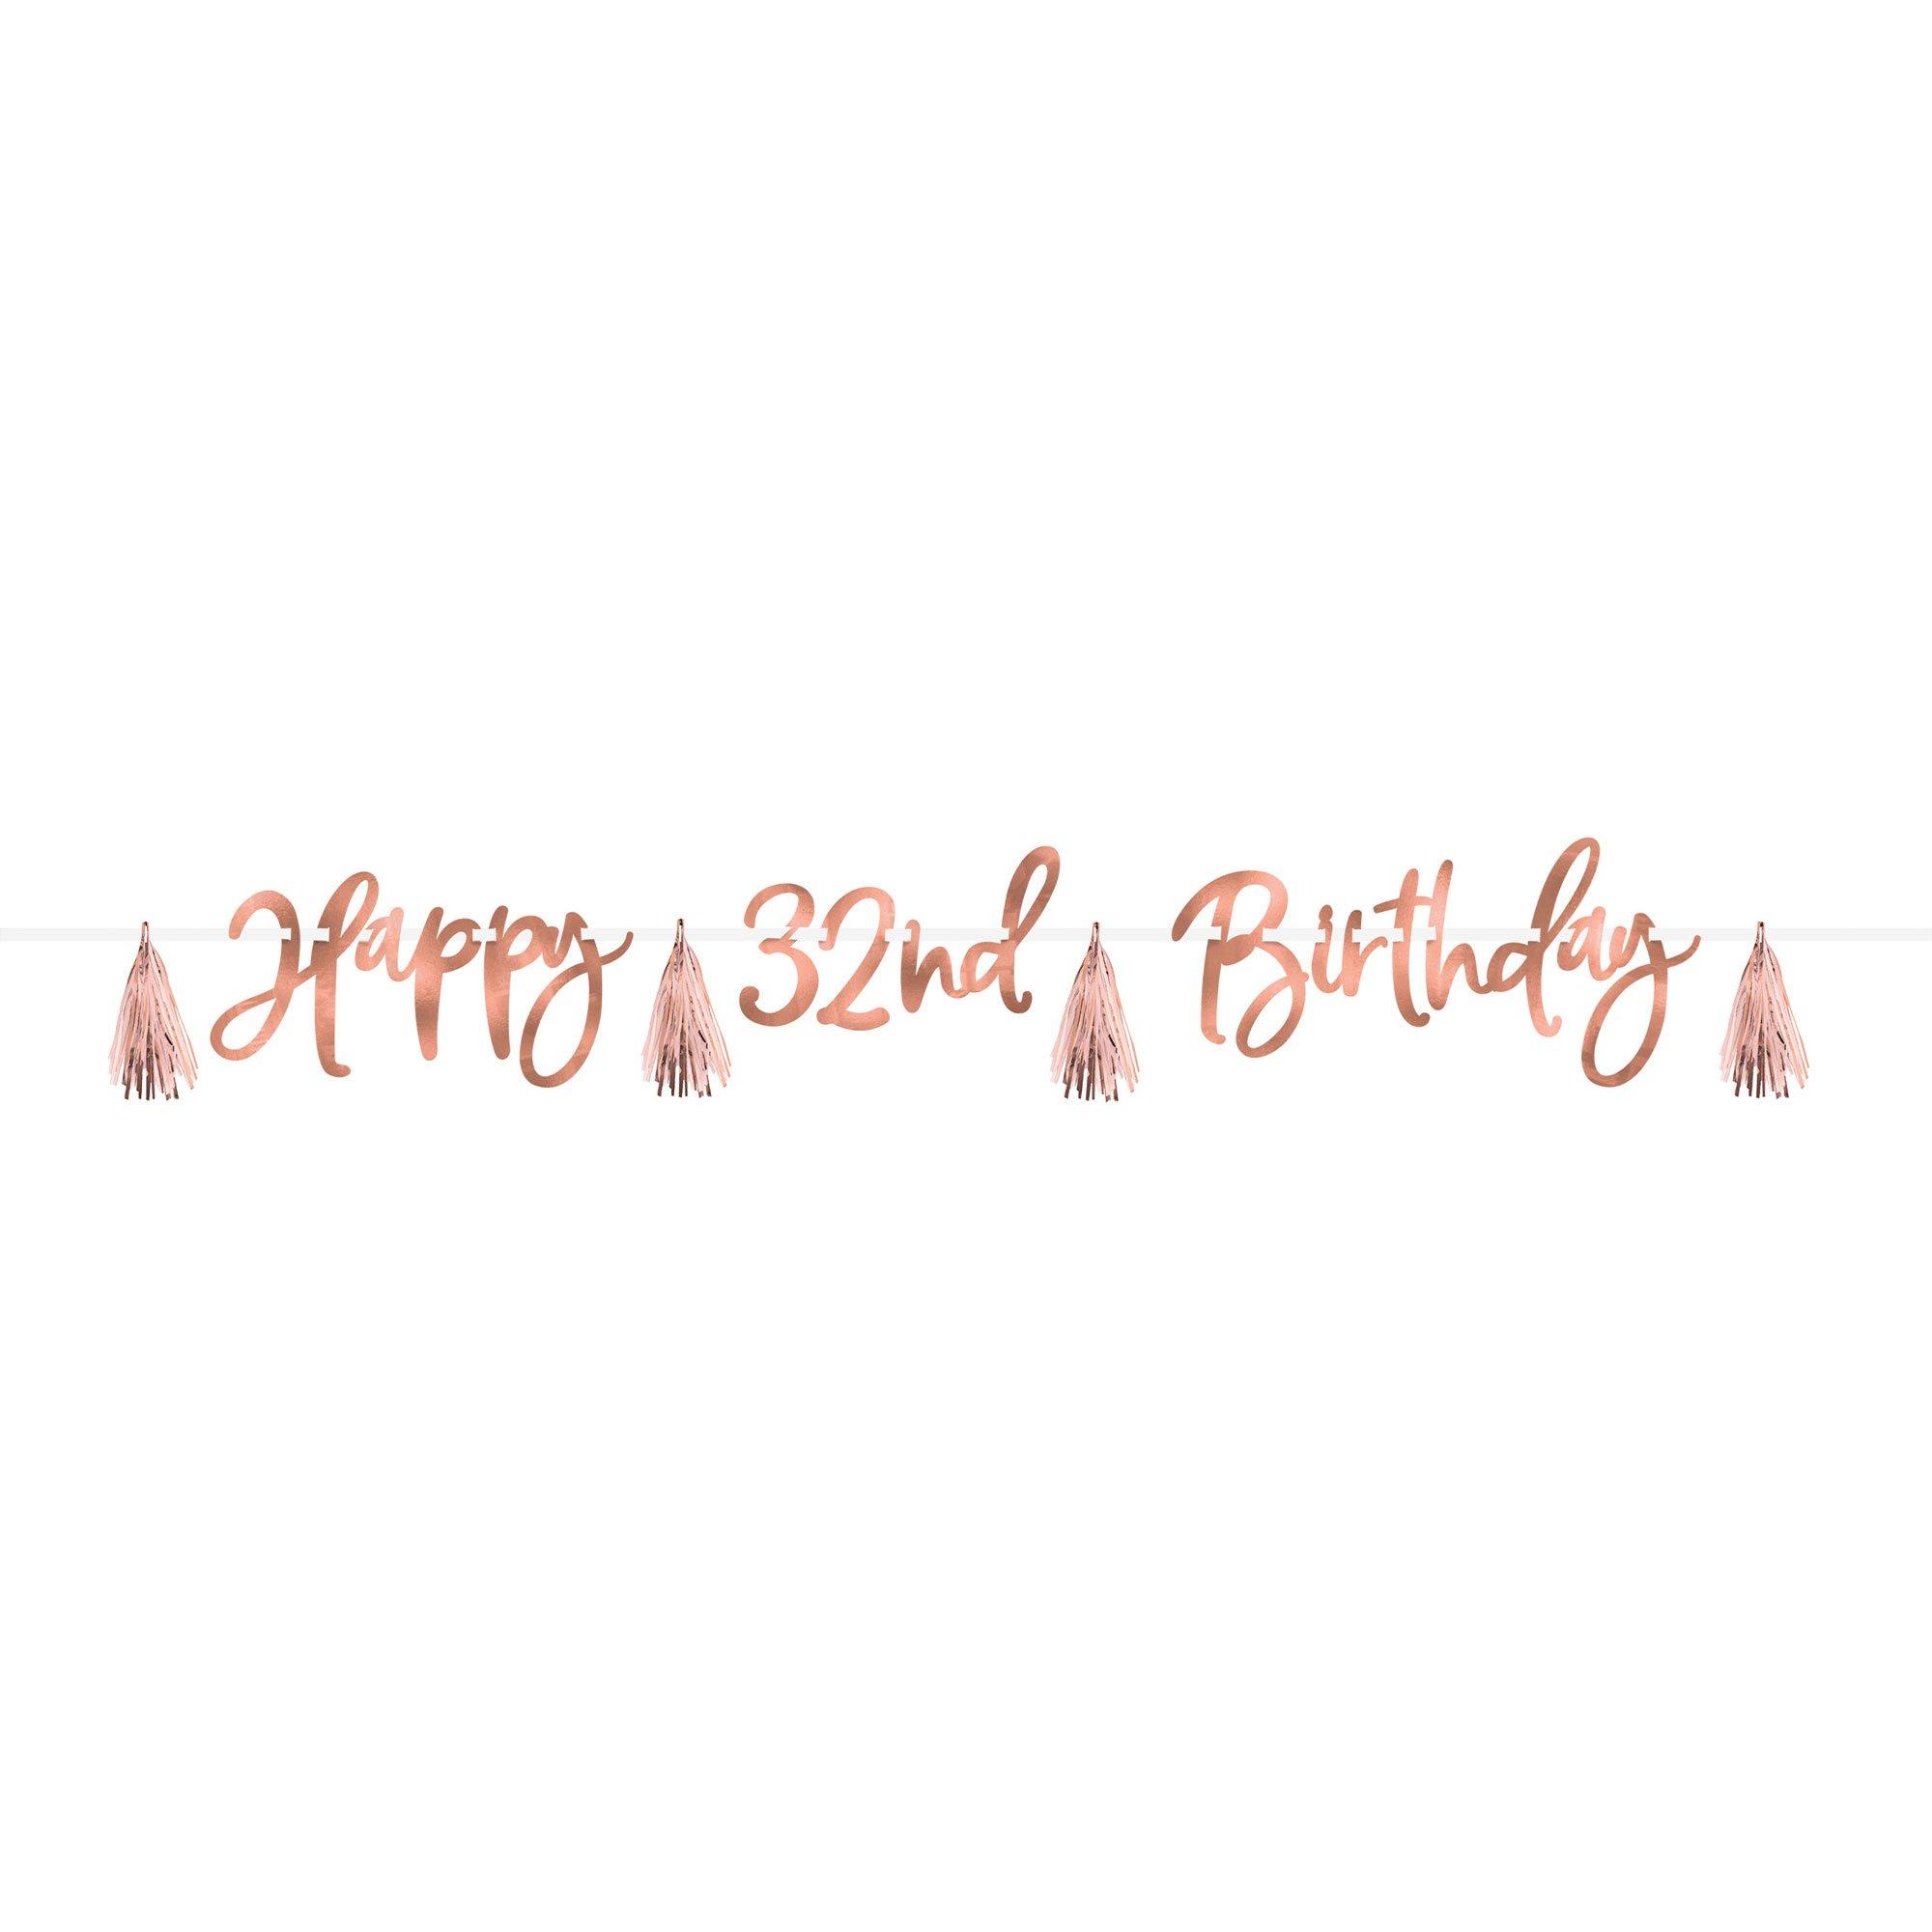 Blush Birthday Customize It Foil Banner Kit